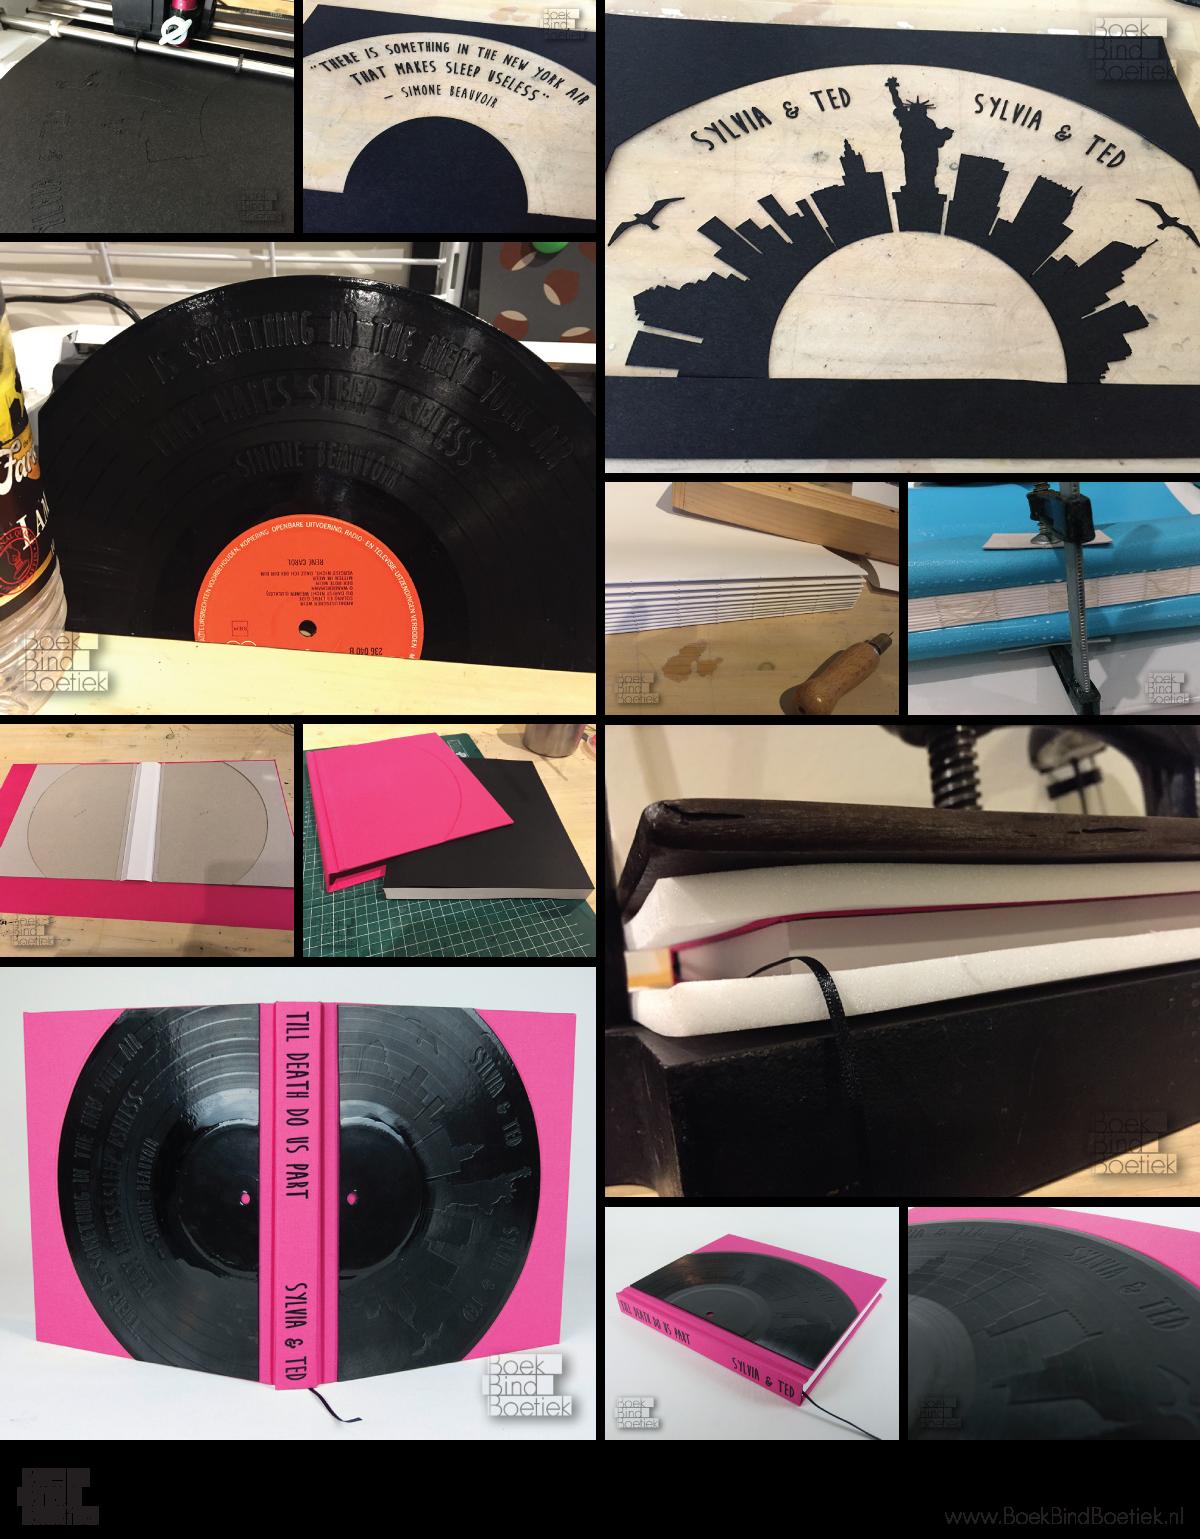 Vinyl Record Book Cover Diy ~ Bookbinding diy tutorials and visuals by boekbindboetiek